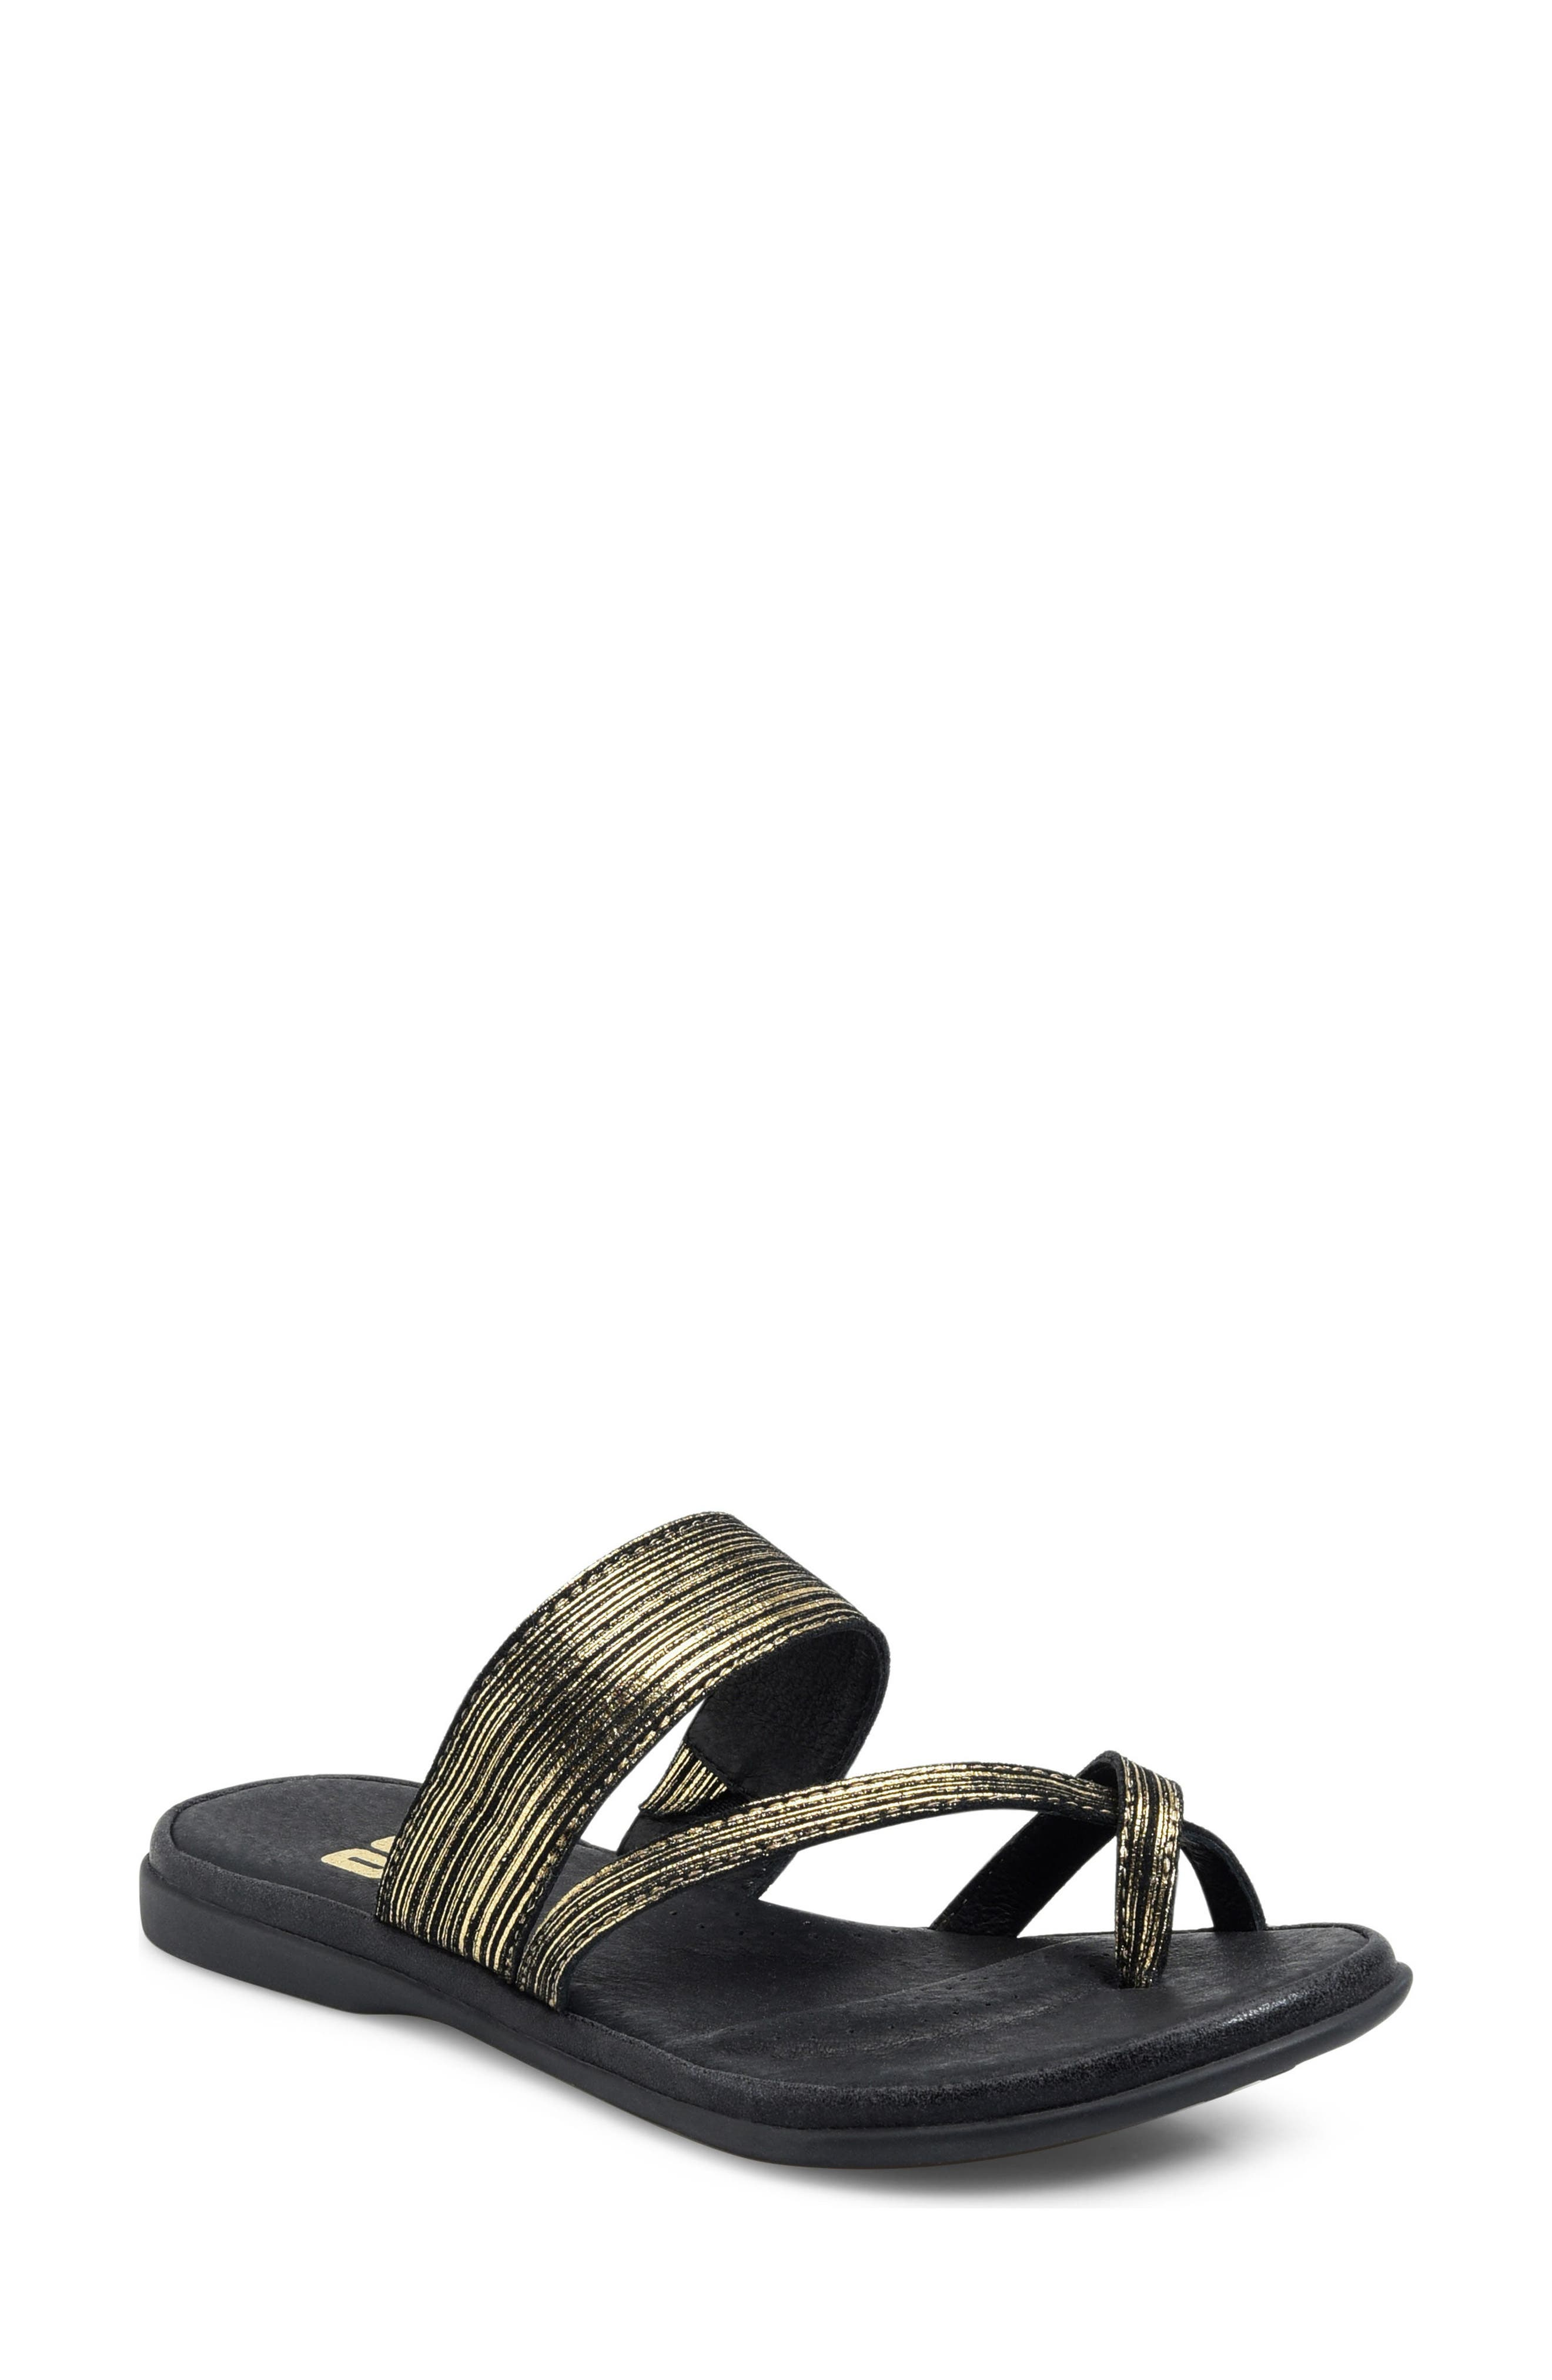 Kia Sandal,                         Main,                         color, Black/ Gold Leather